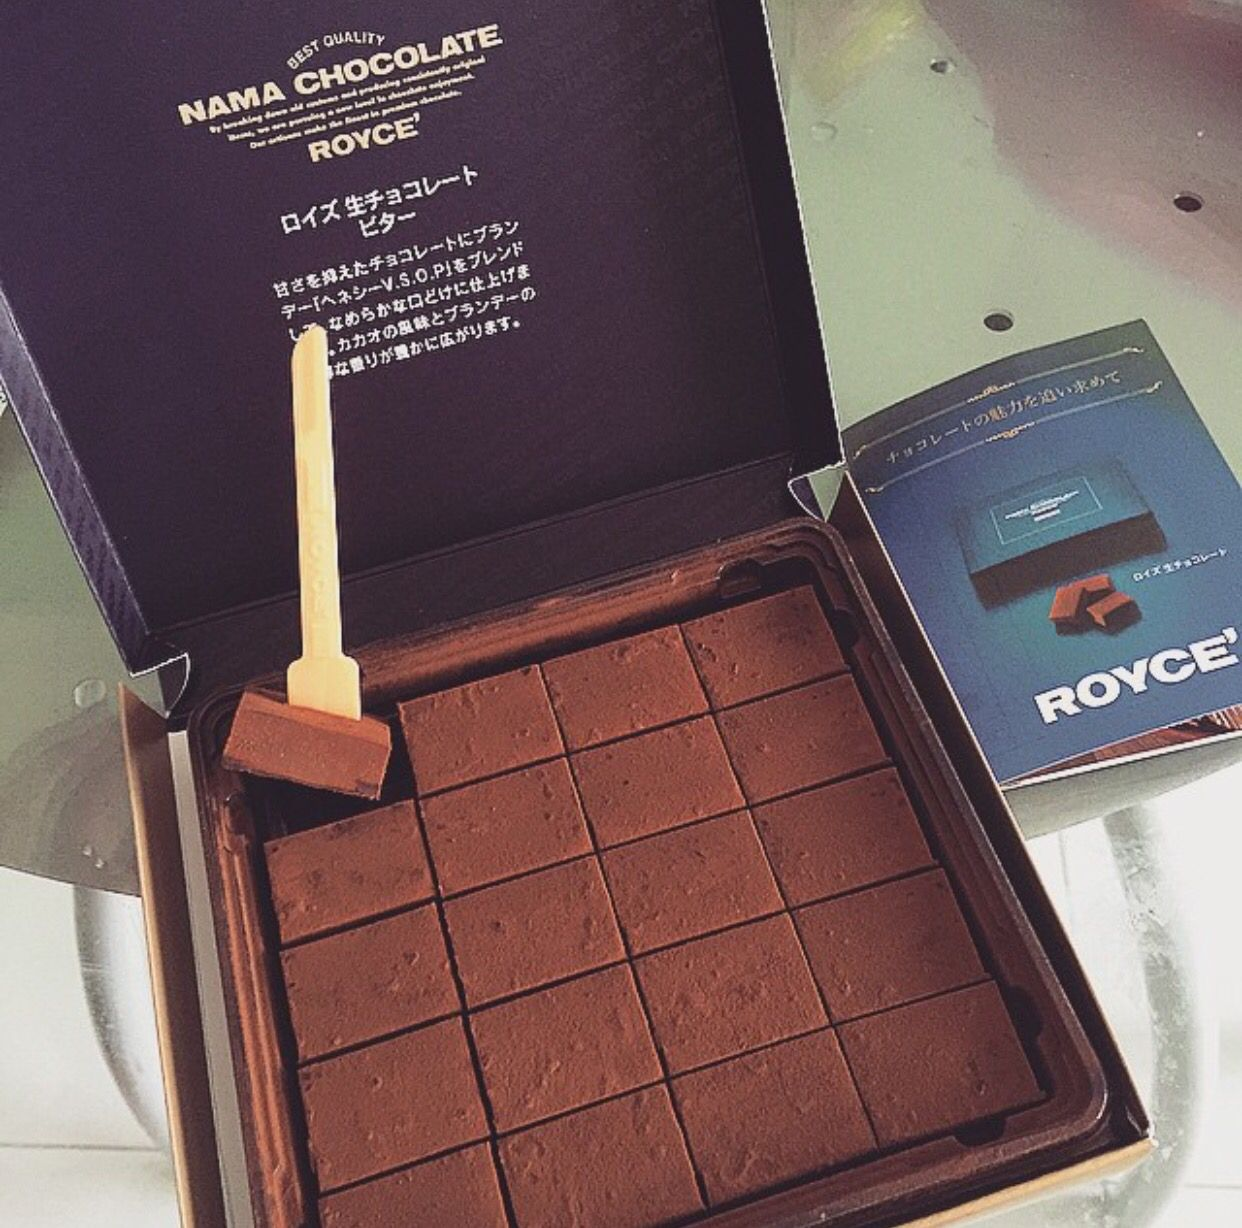 toko cokelat jakarta Royce Chocolate